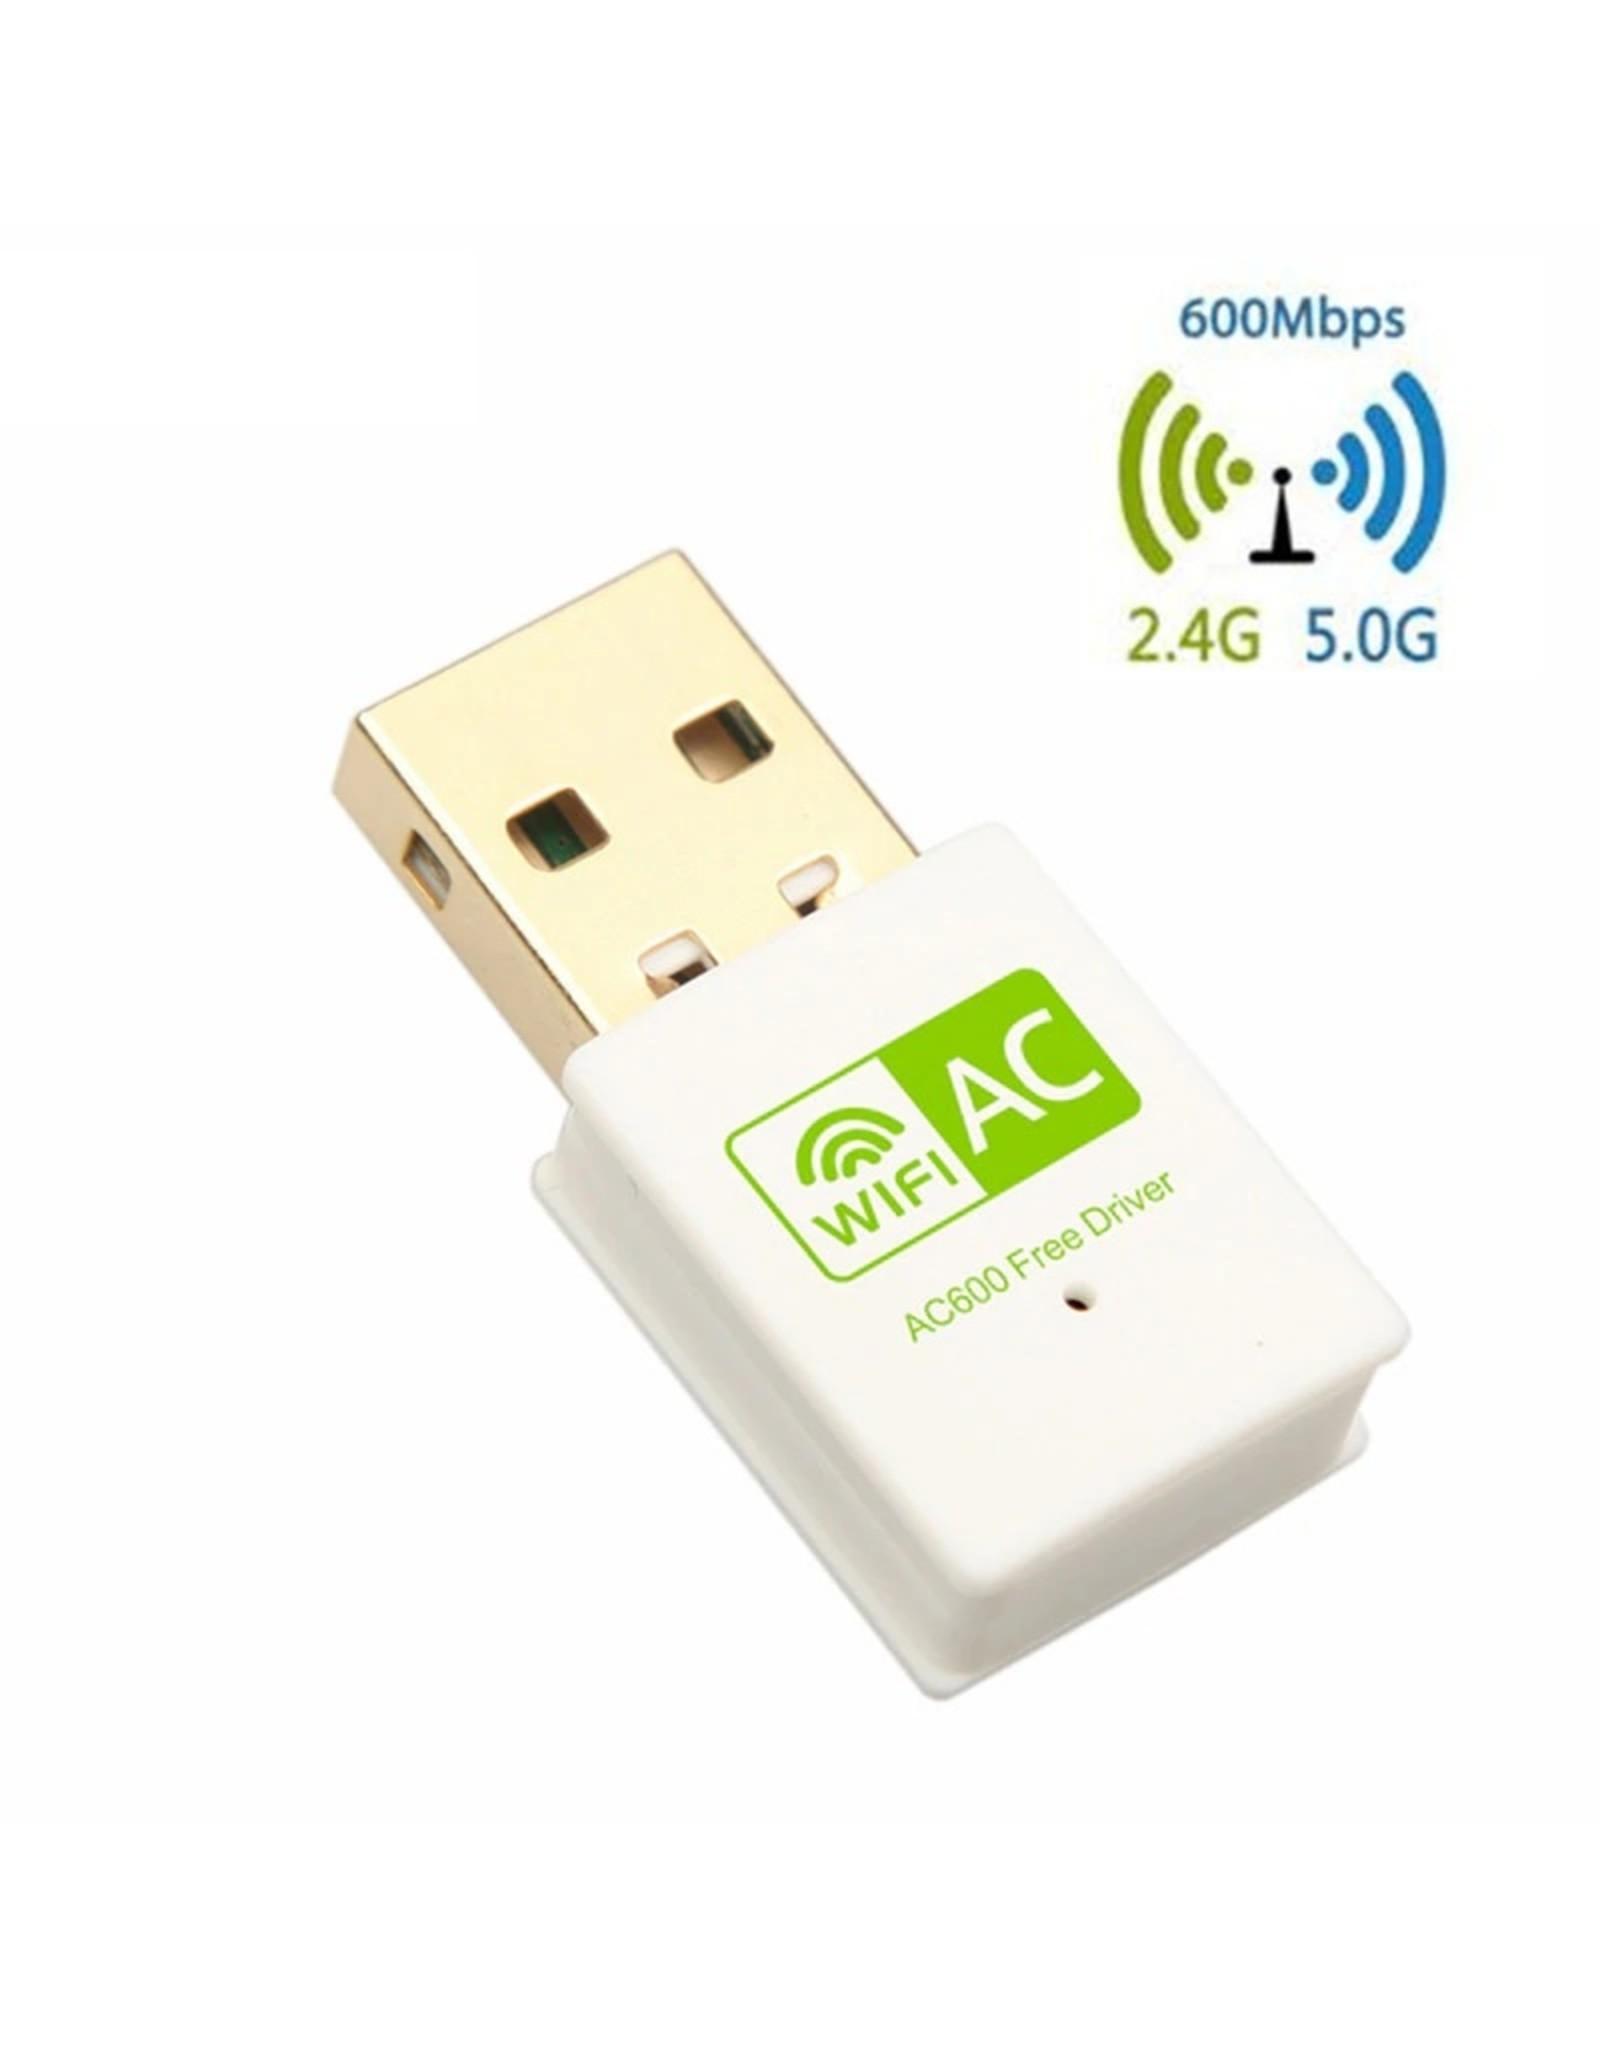 Merkloos USB AC Wifi Adapter